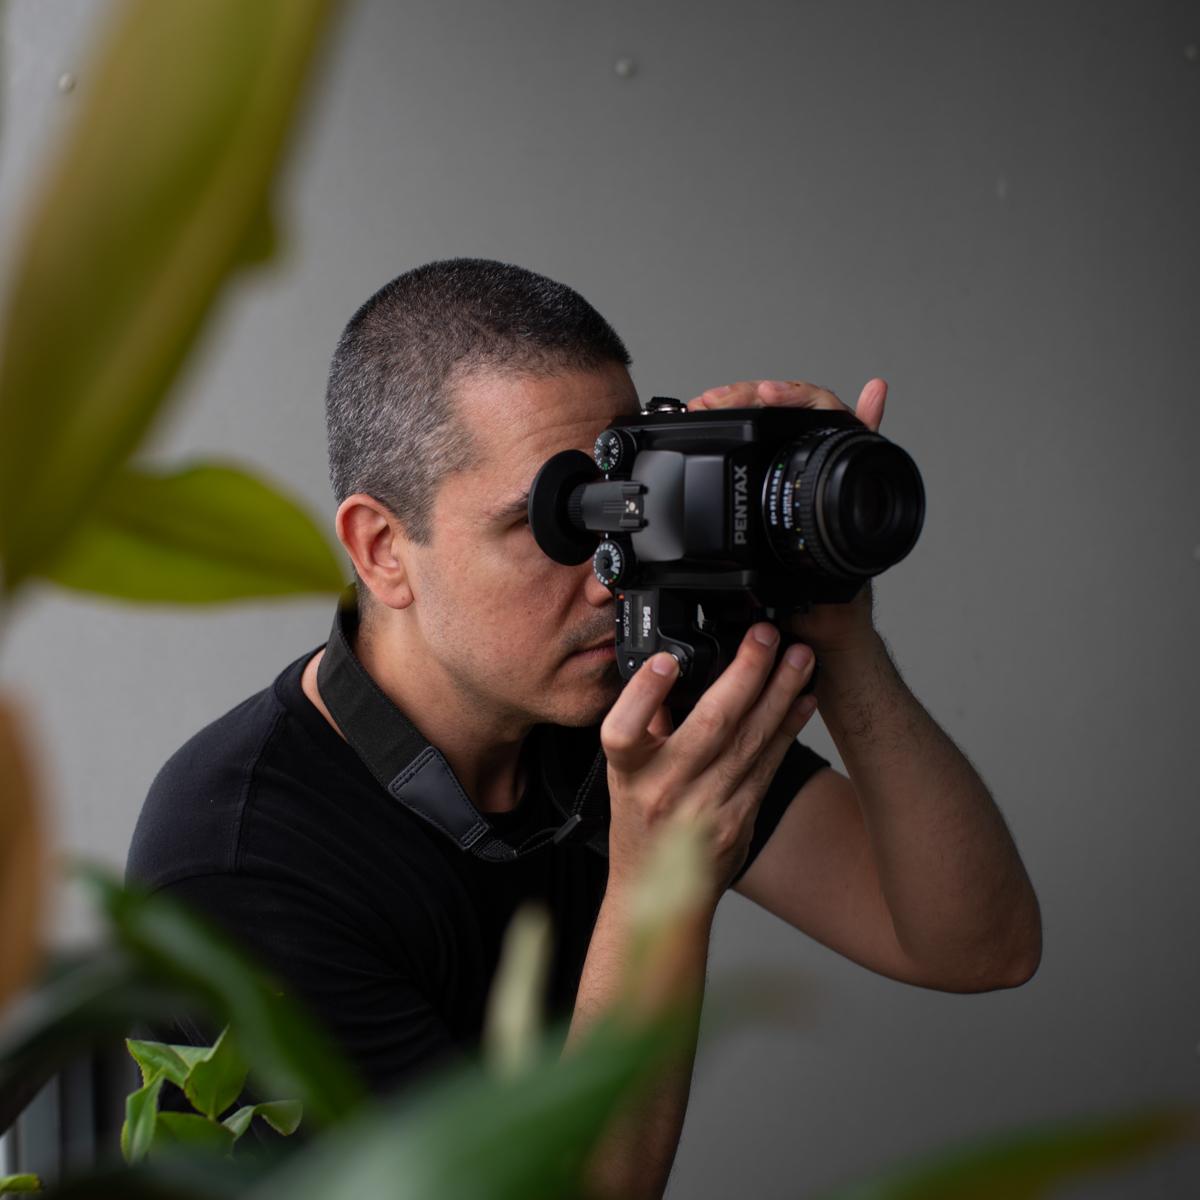 London-photographer-JC-Candanedo-Grey-Pistachio-Fashion-Corporate-Portraits-Headshots-Blog-Creative-Industry-London-sustainable-environment-eco-friendly-photography.jpg